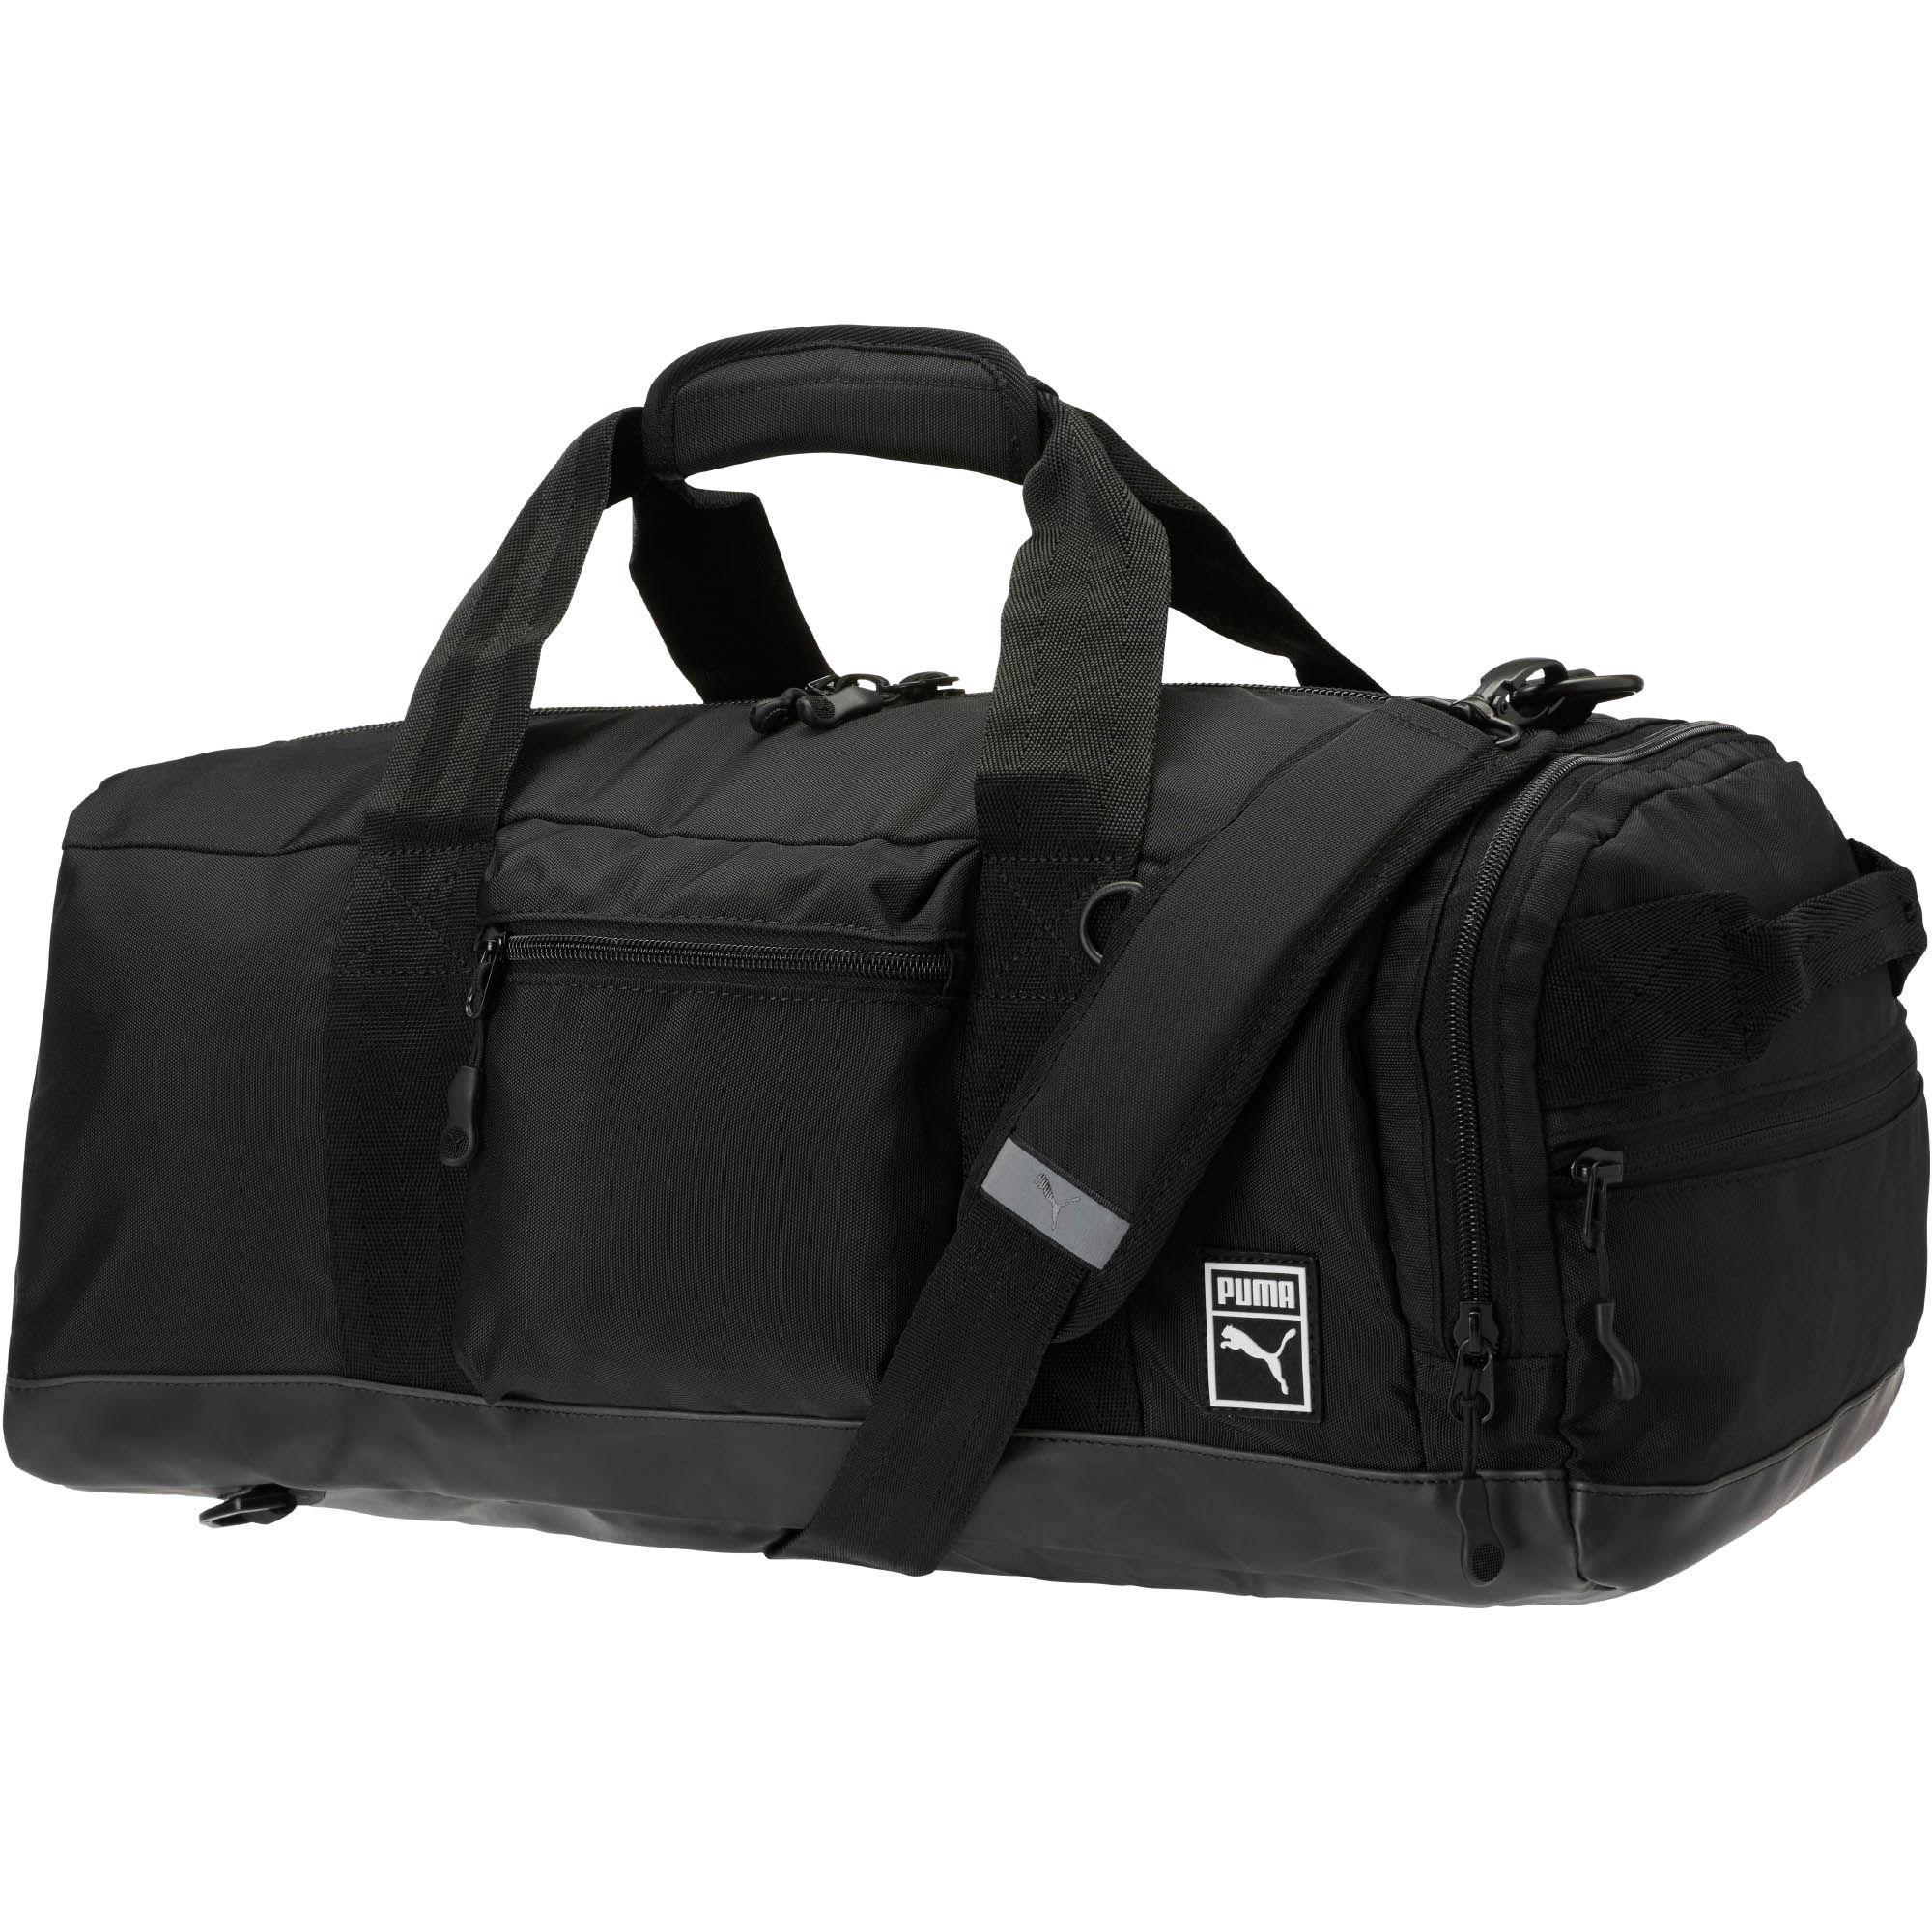 2f538ec6508a Lyst - PUMA Convert Hybrid Duffel Bag in Black for Men